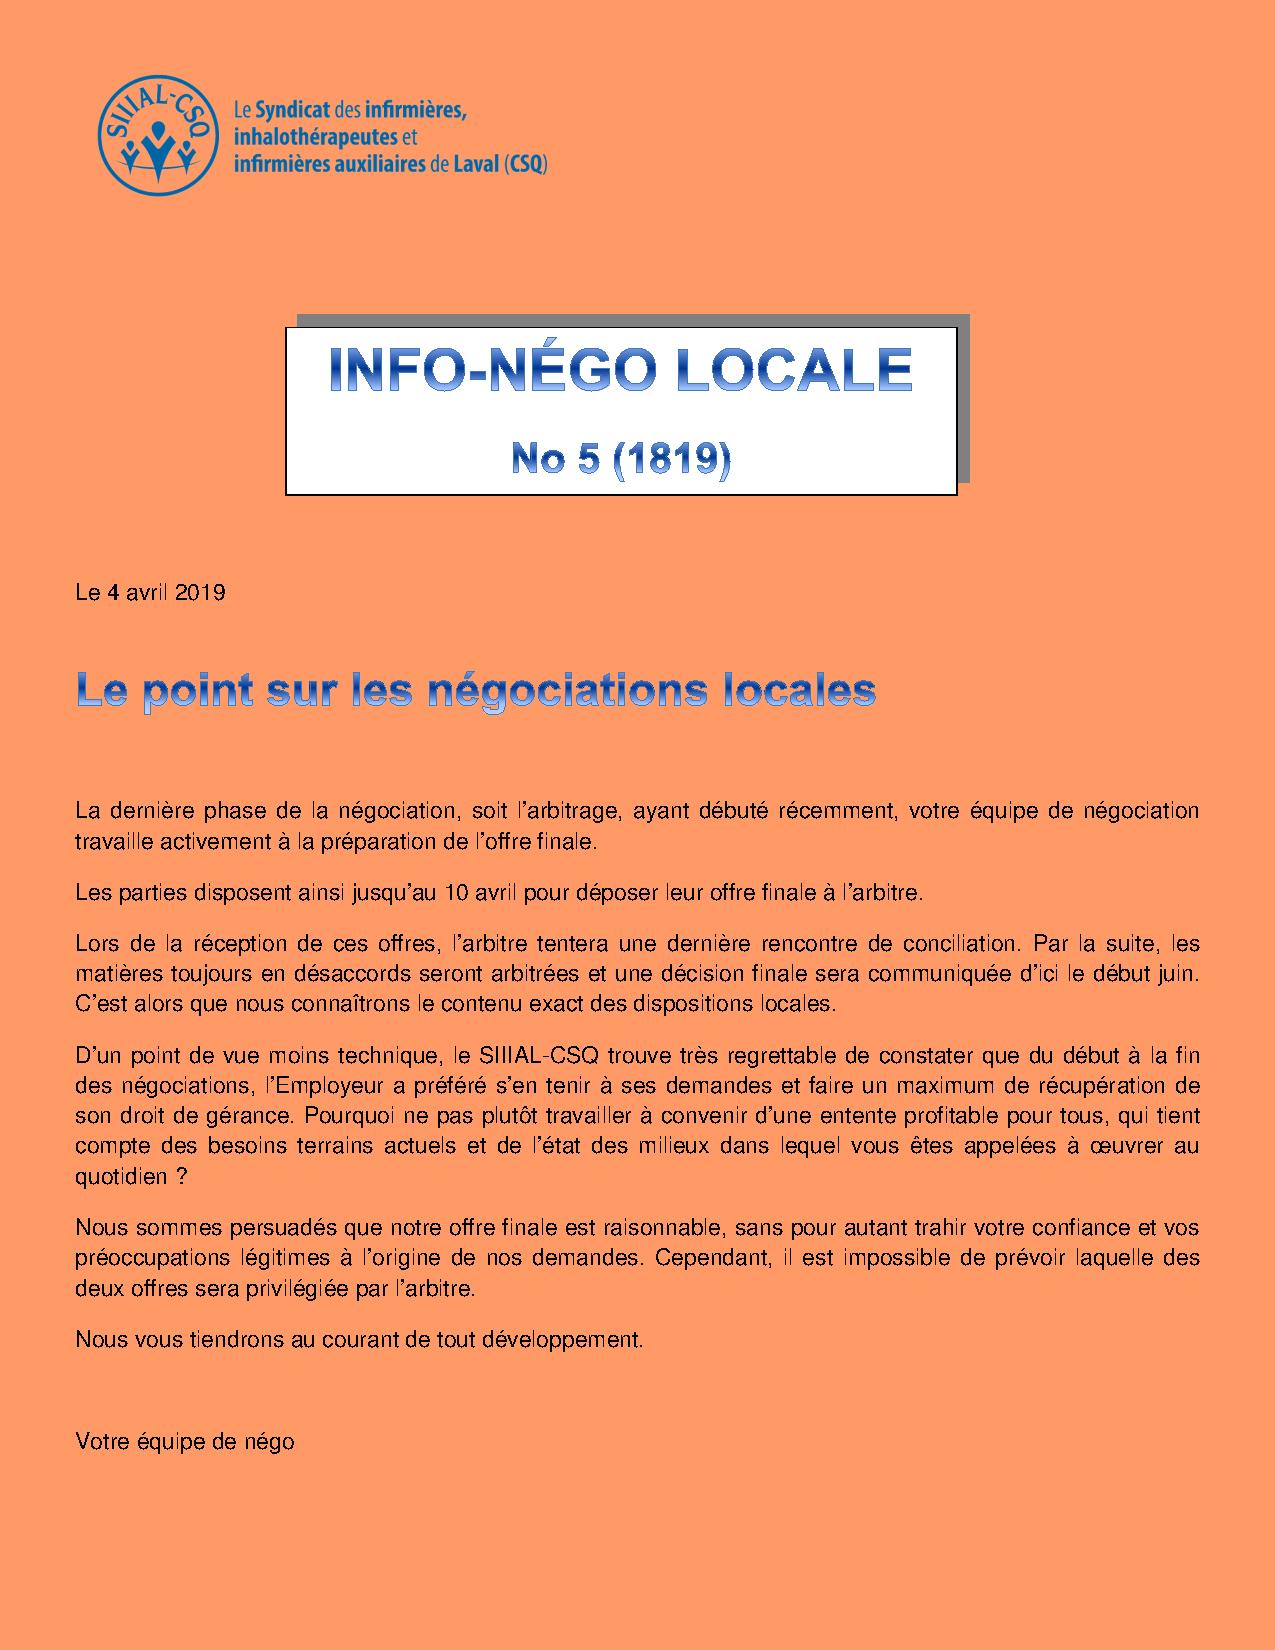 info-nego-locale-no-5-1819